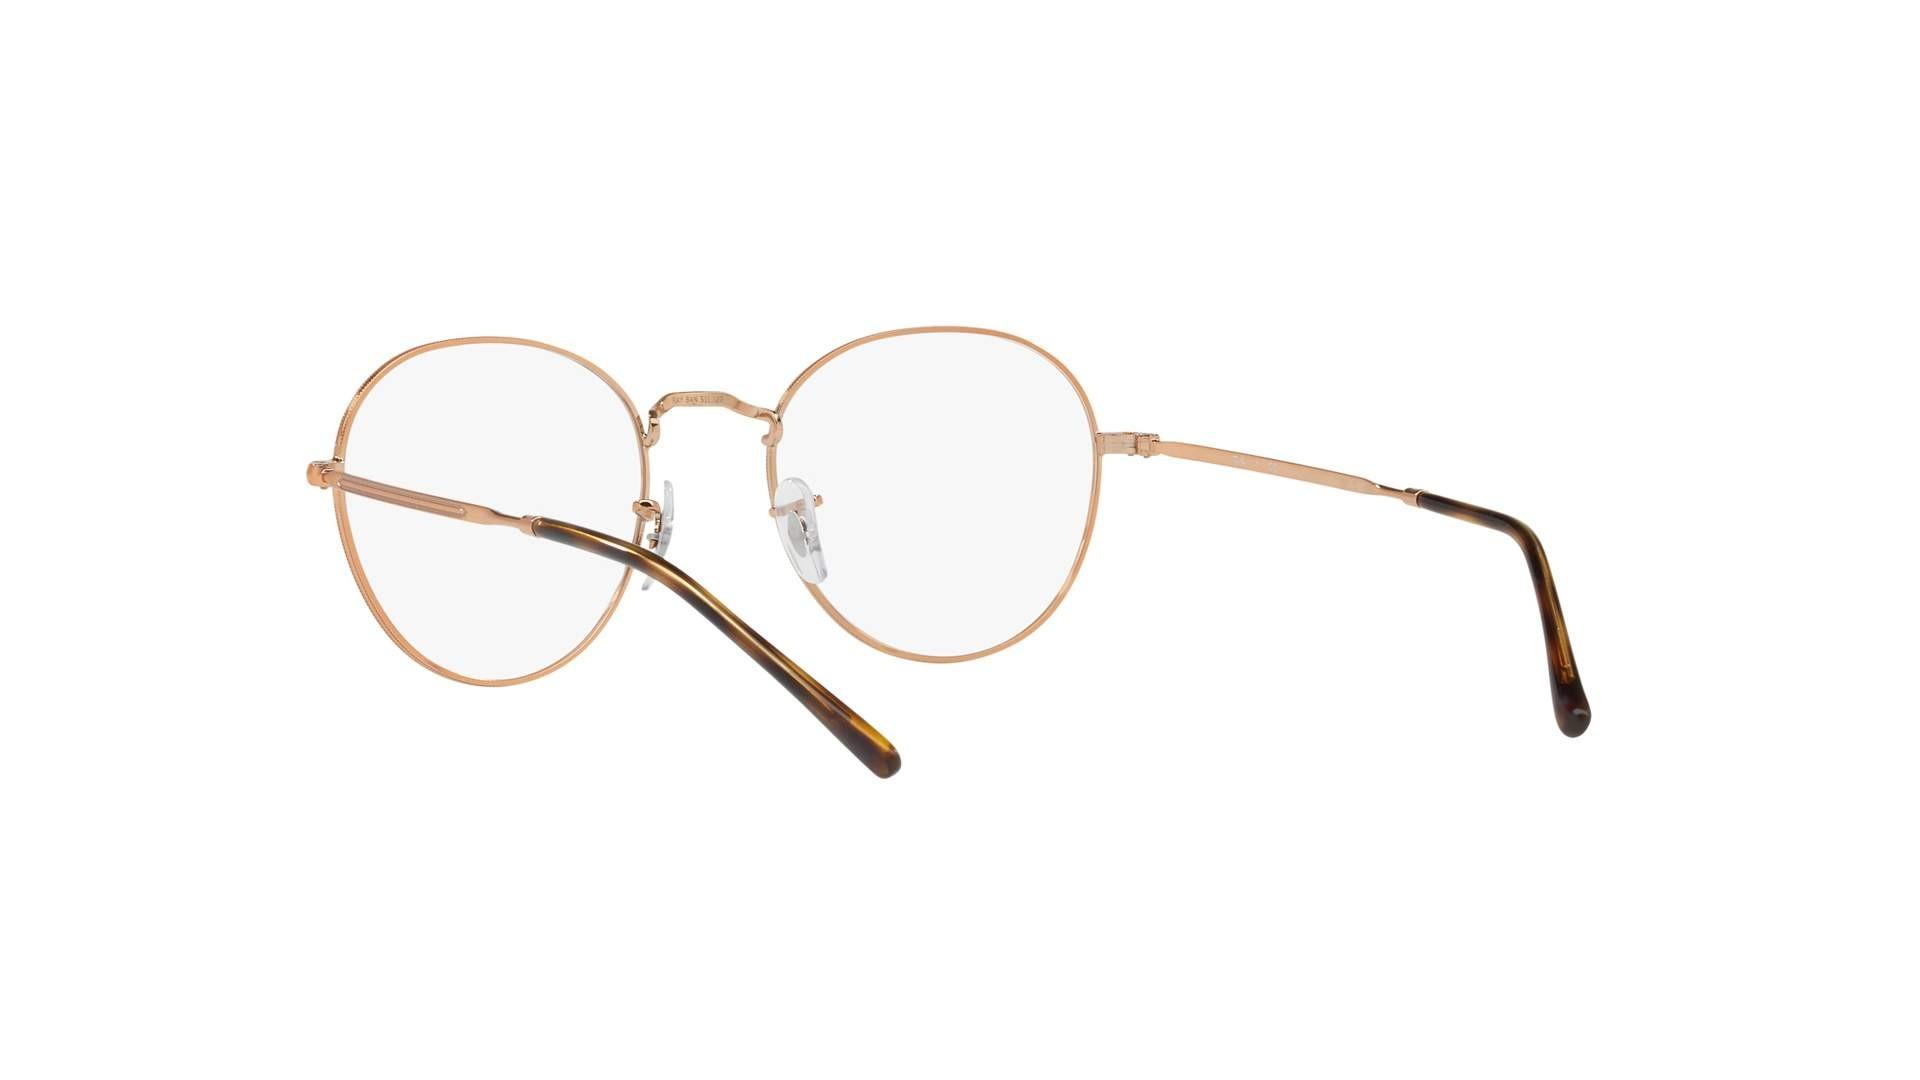 6c78e81a1c Eyeglasses Ray-Ban RX3582V 2943 49-20 Copper Small